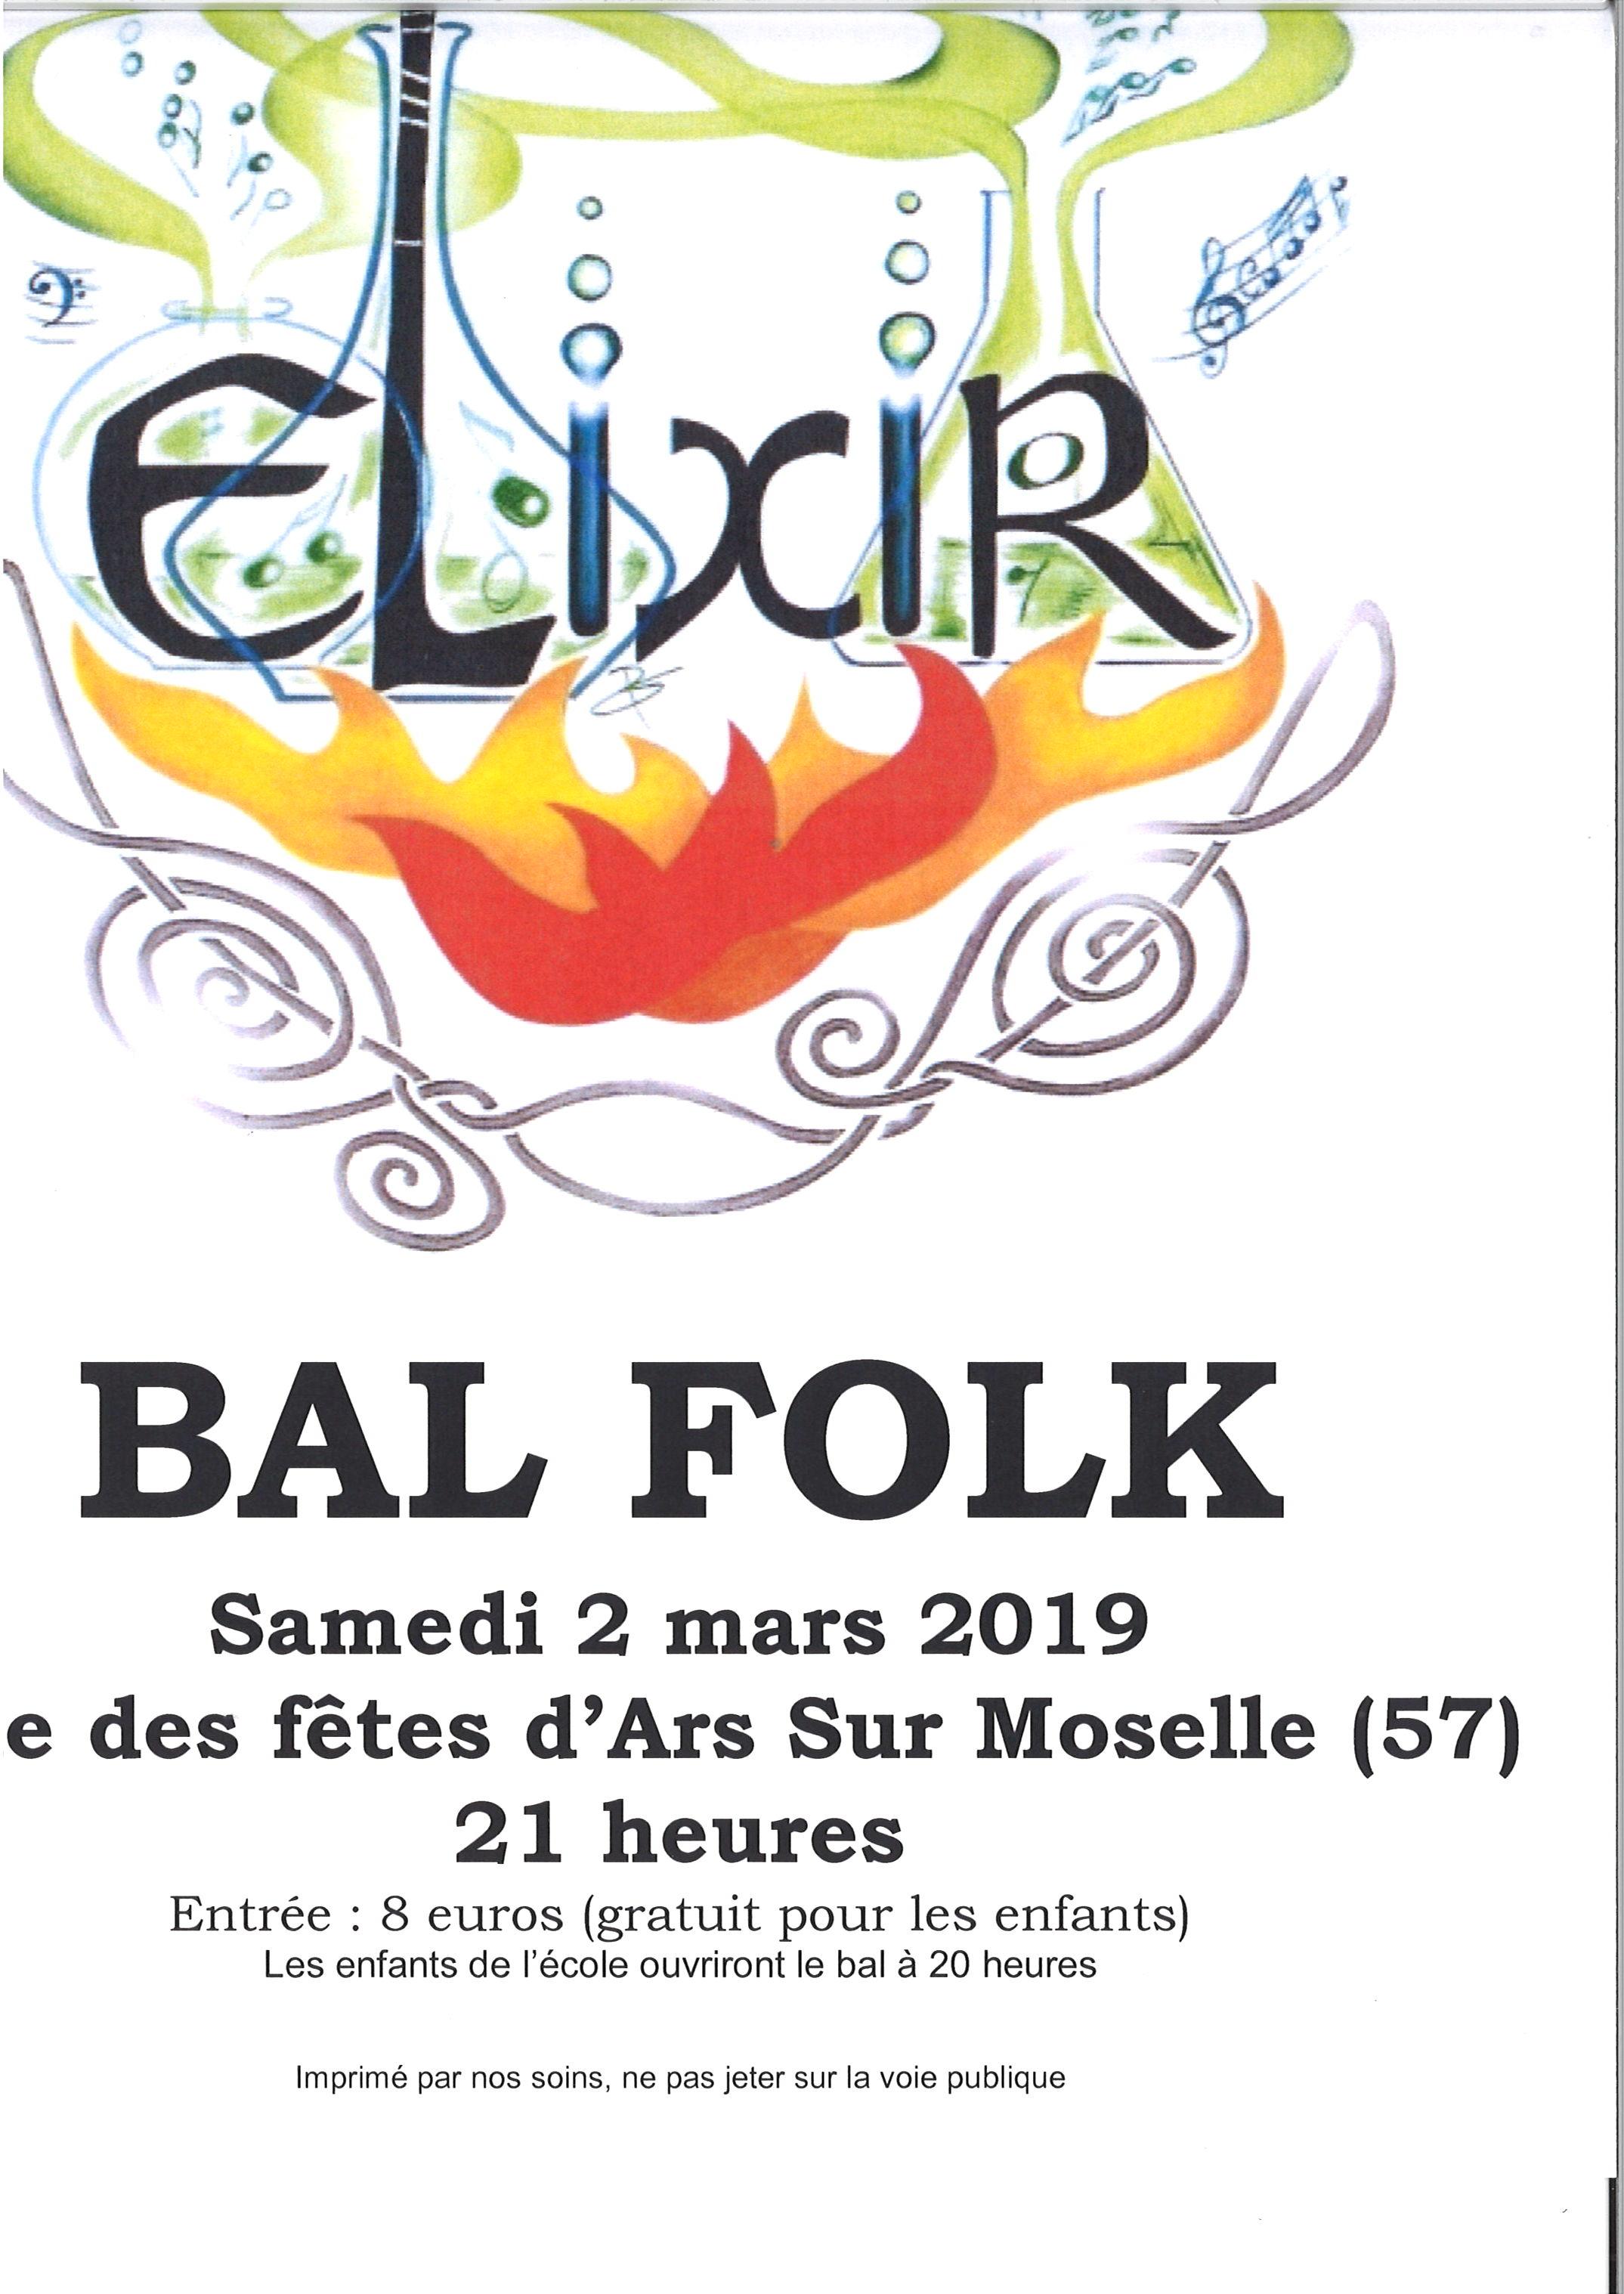 BAL FOLK samedi 2 mars